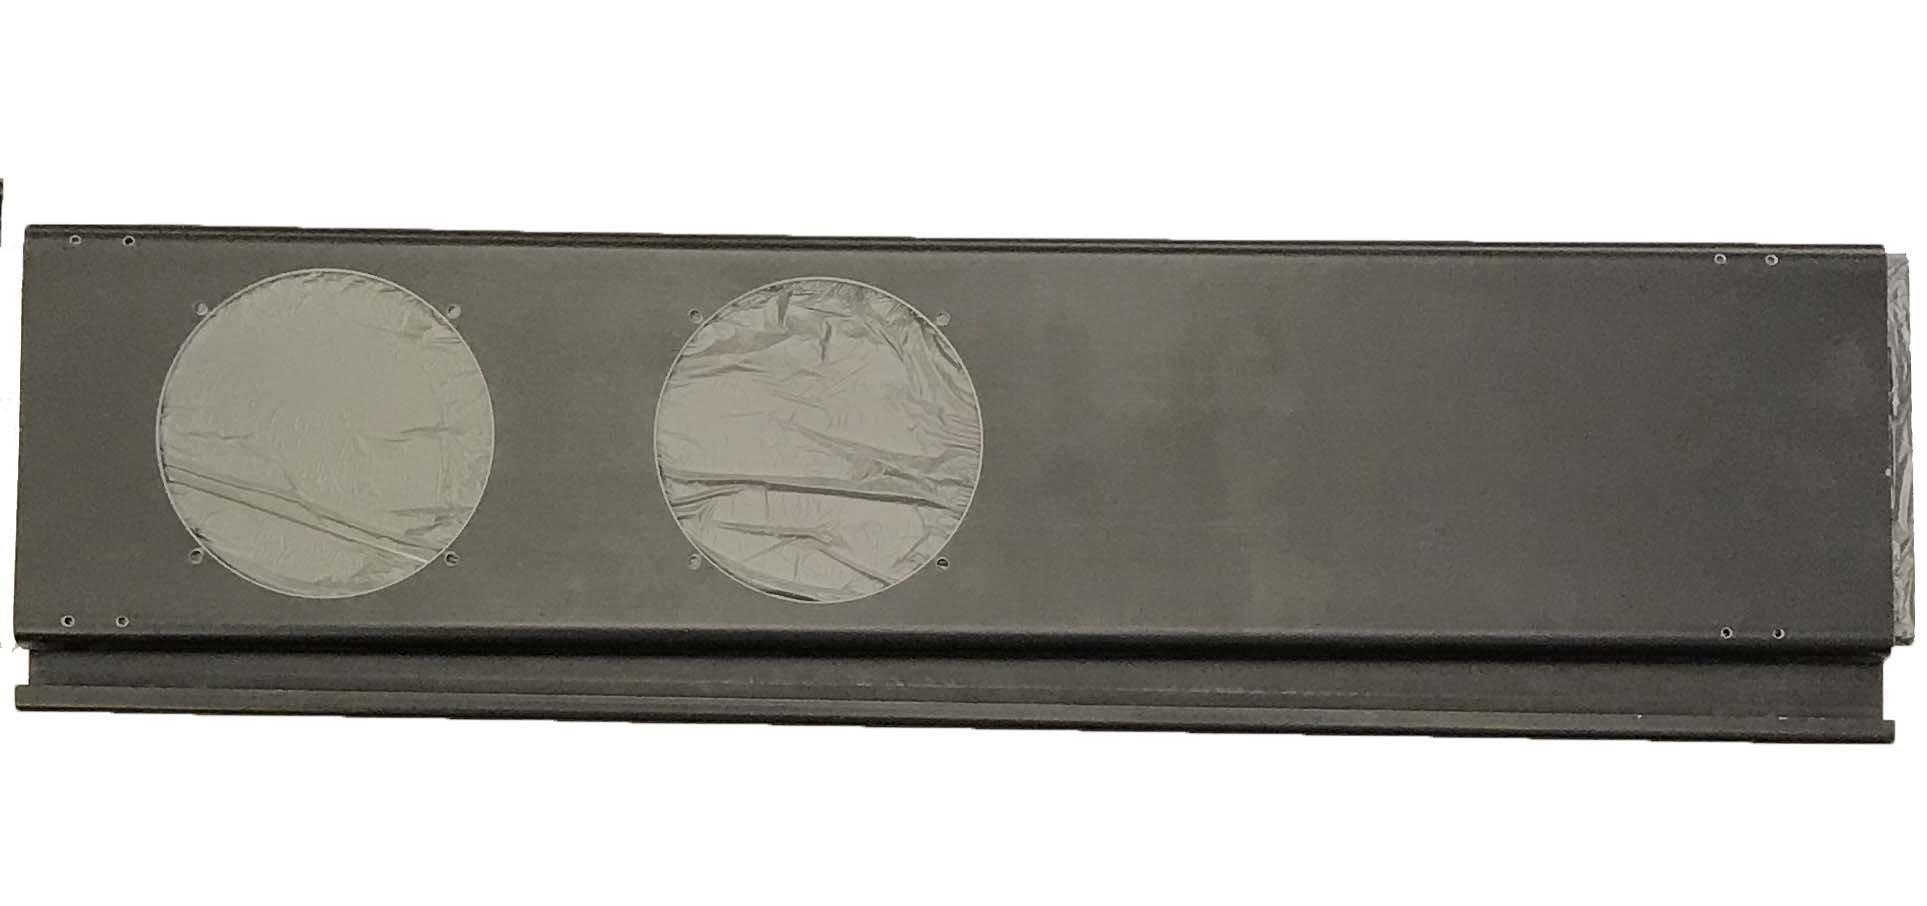 OEM Danby Air Conditioner BLACK Two Hole Window Slider for DPA110DHA1CP, DPAC13009, DPA120DHA1CP, DPAC7099